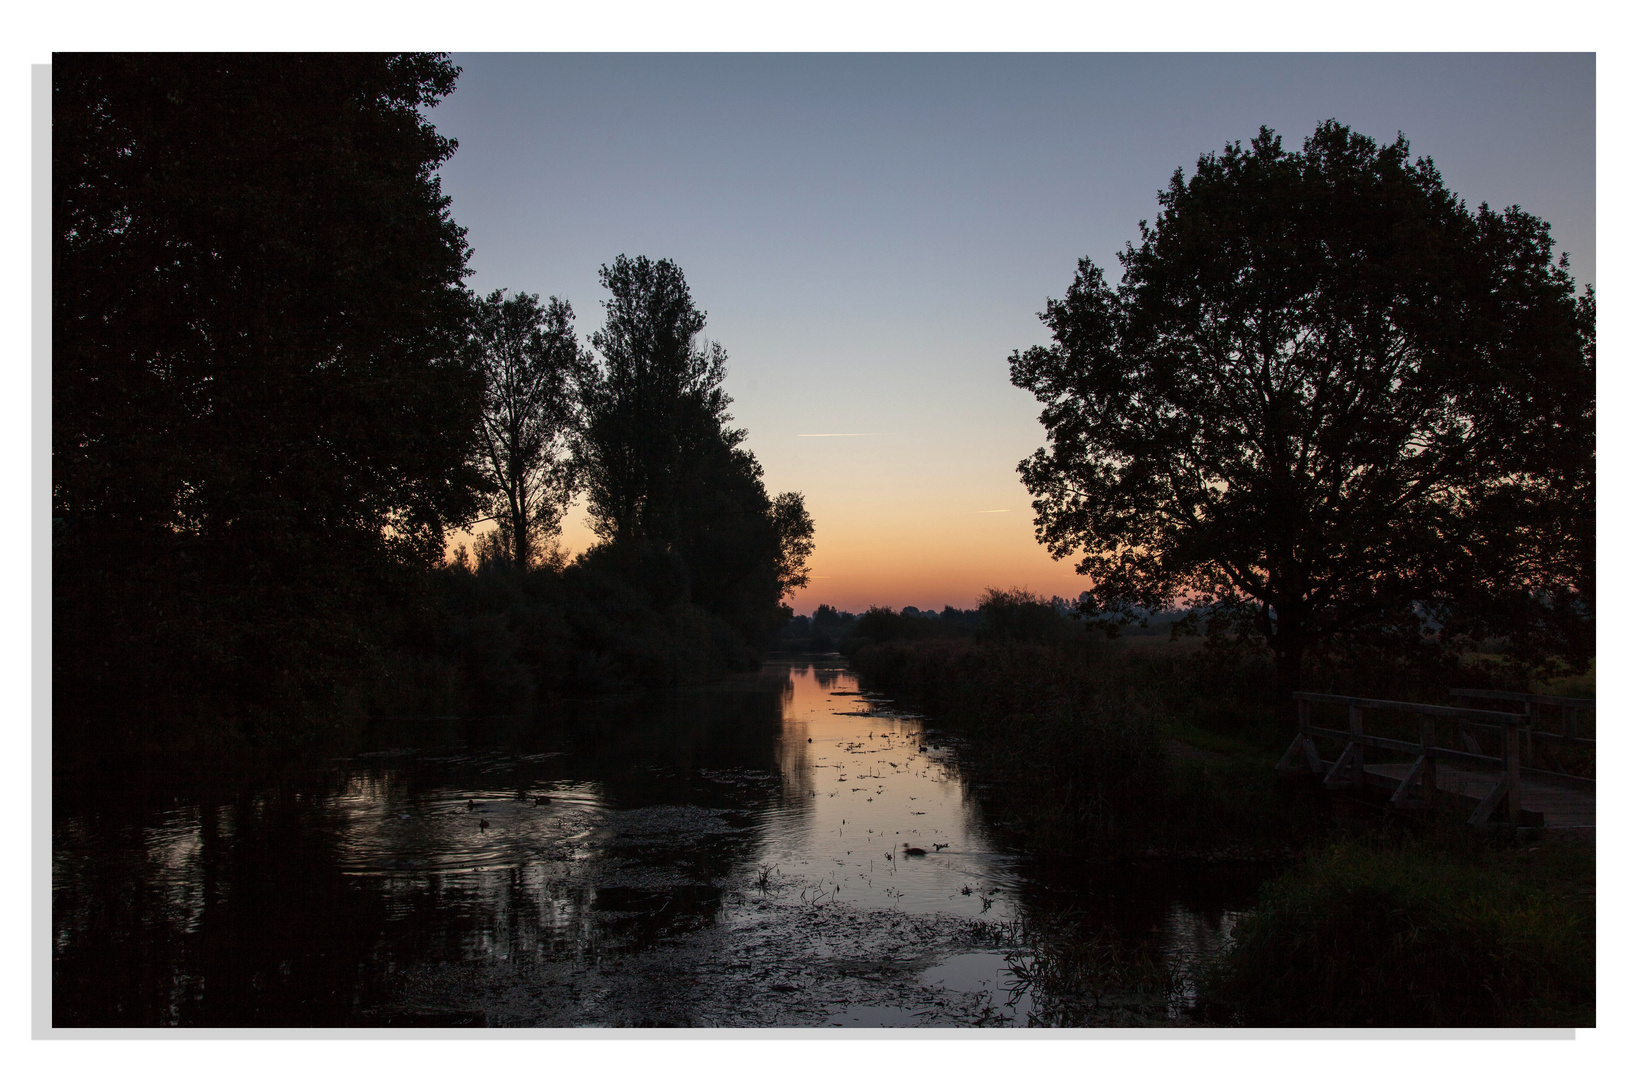 Sonnenaufgang an der Trave